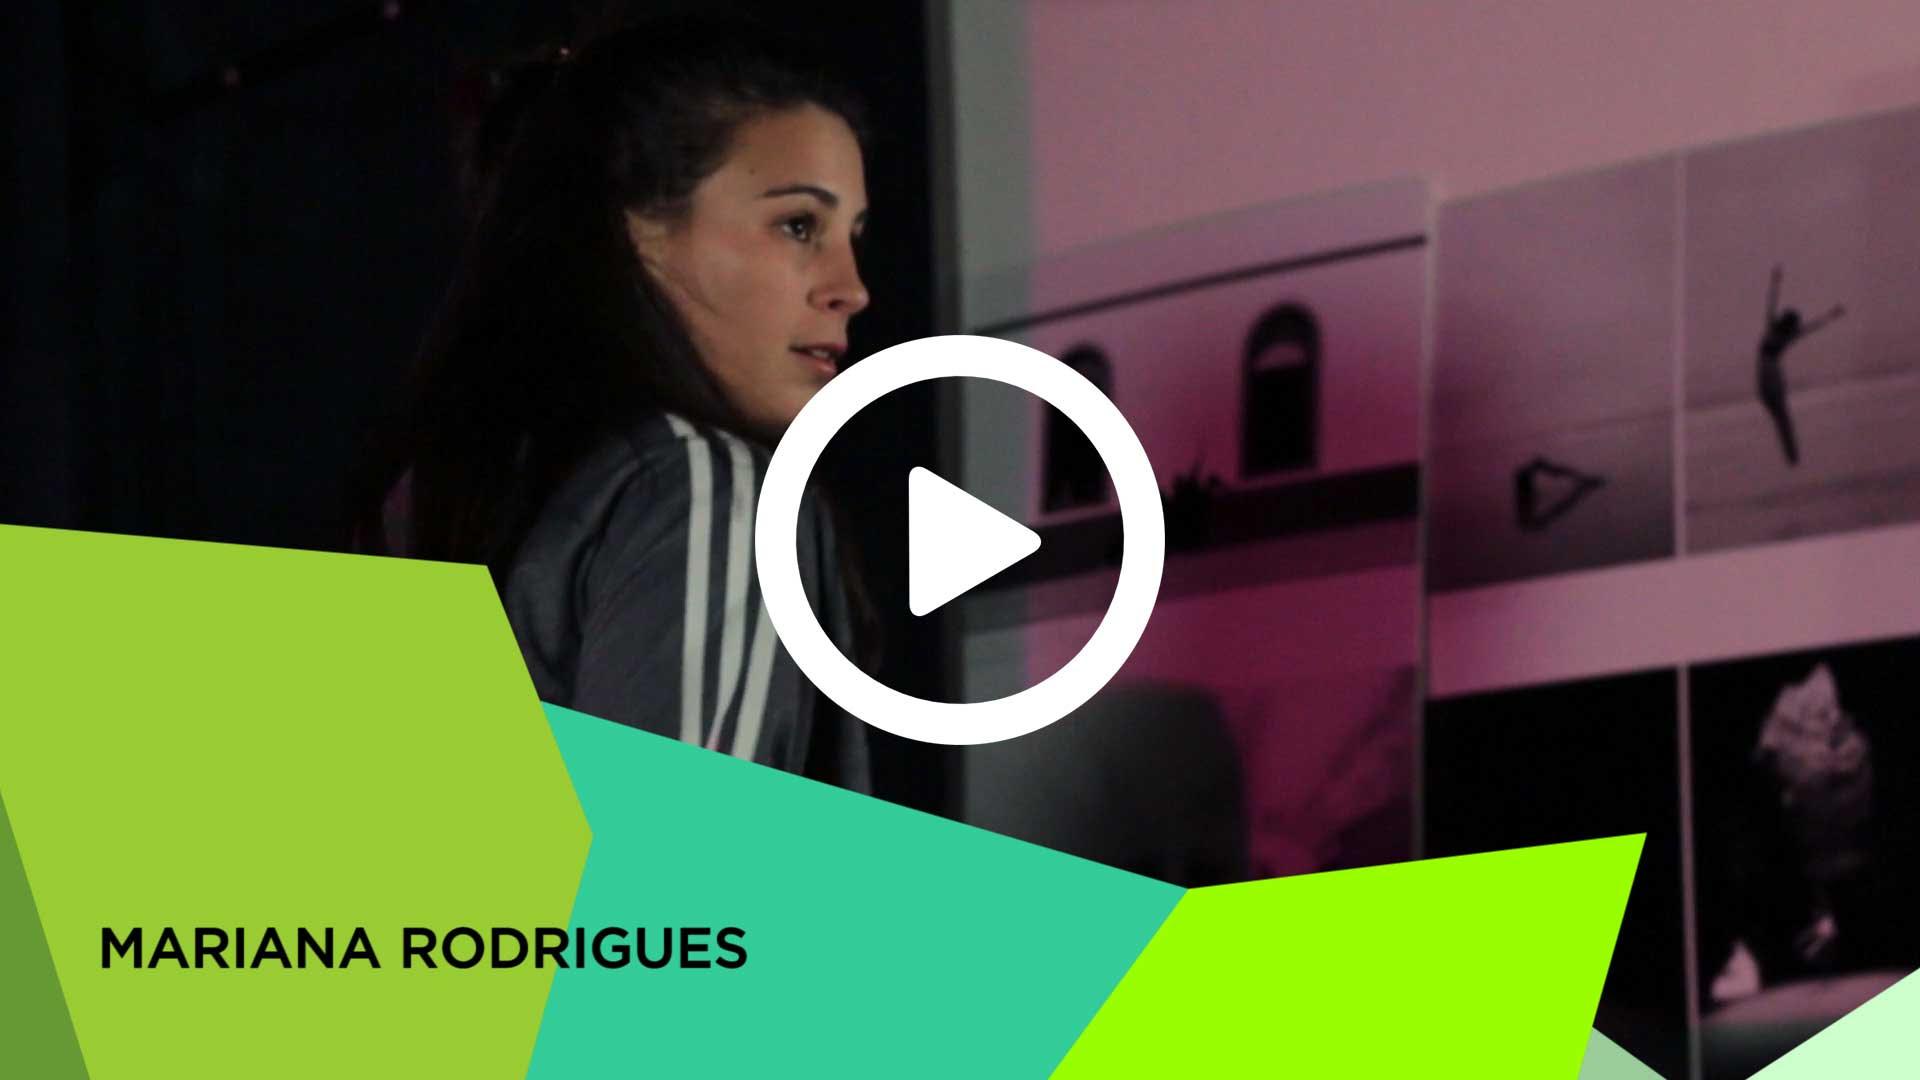 #KimaheraSections - Mariana Rodrigues - Janeiro'17 #7